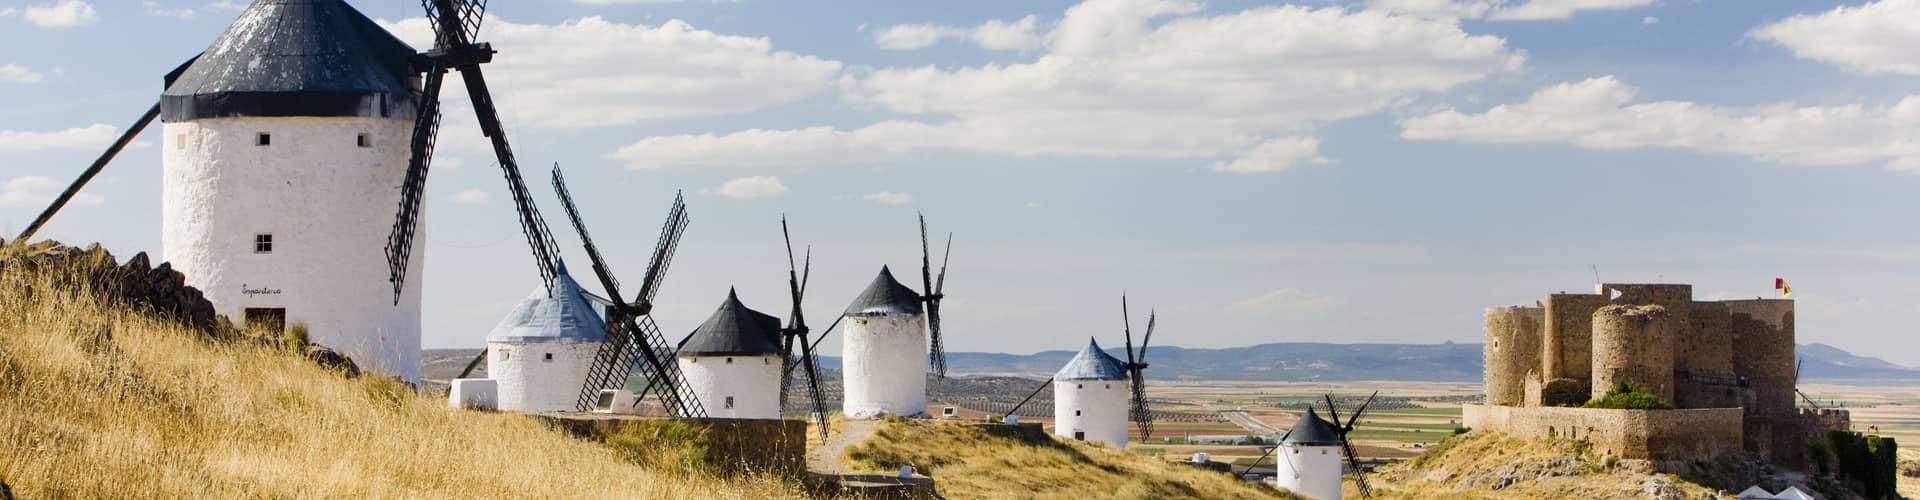 Kamperen in Castilië-La Mancha